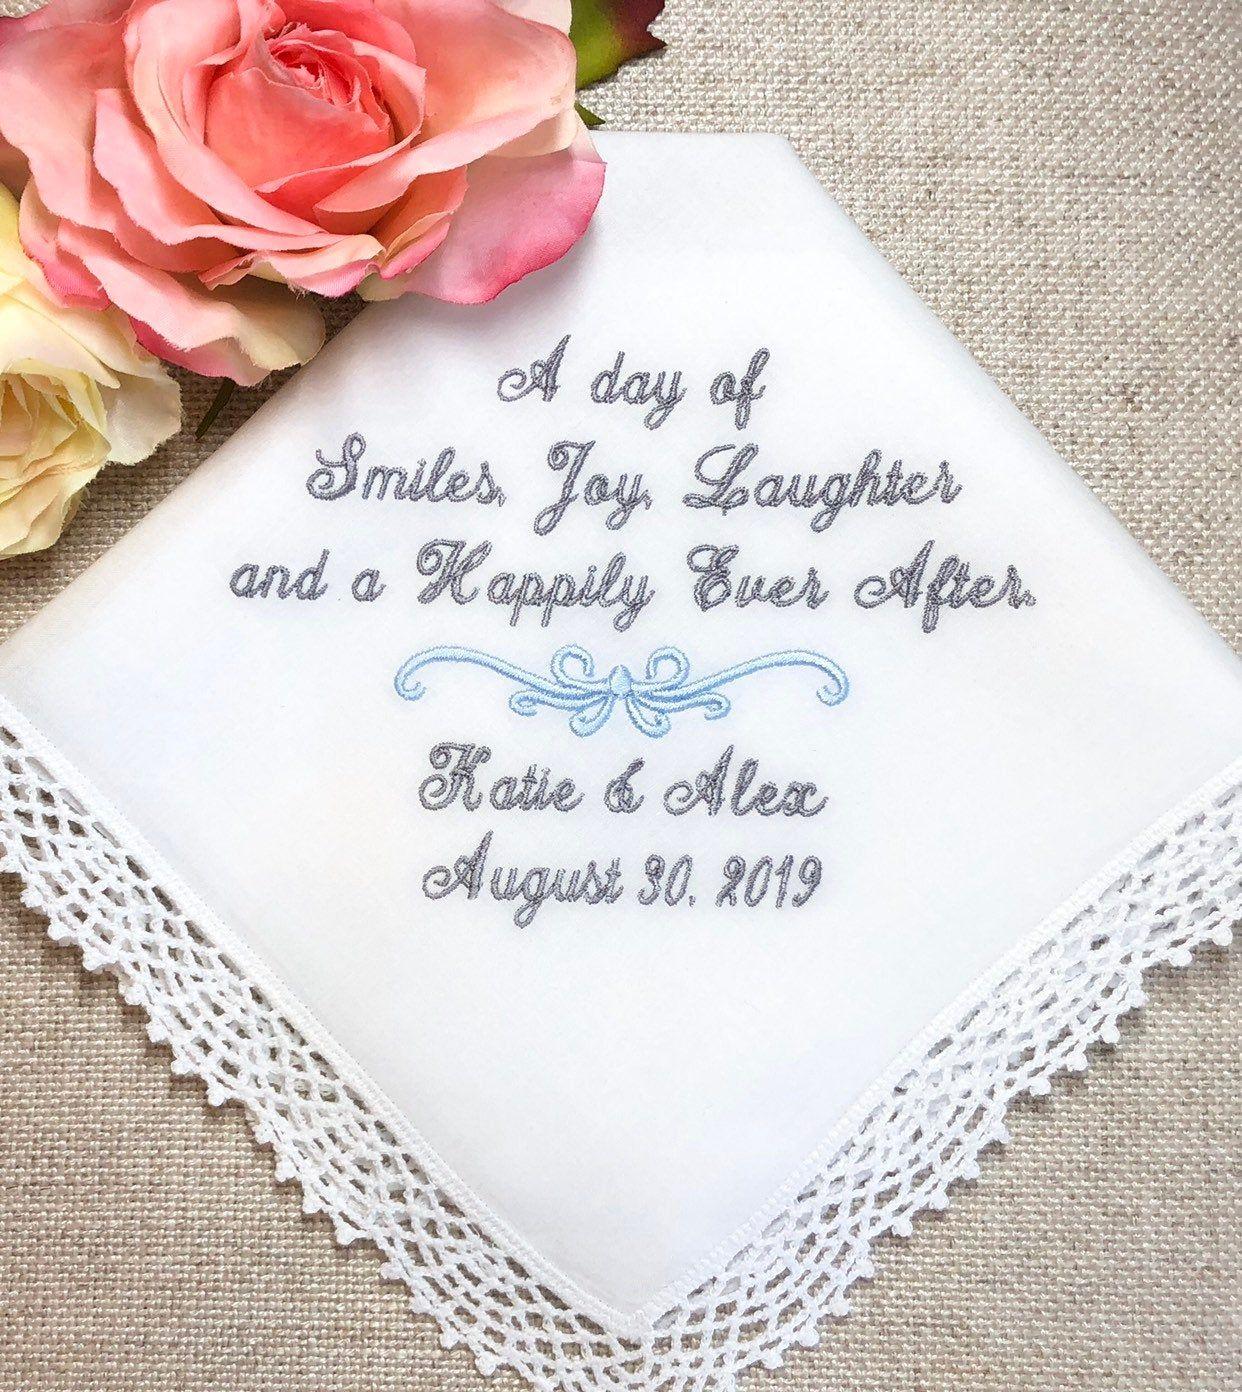 Something Blue Gift For Bride Brides Wedding Handkerchief Etsy In 2020 Wedding Hankerchief Bride Gifts Wedding Handkerchief